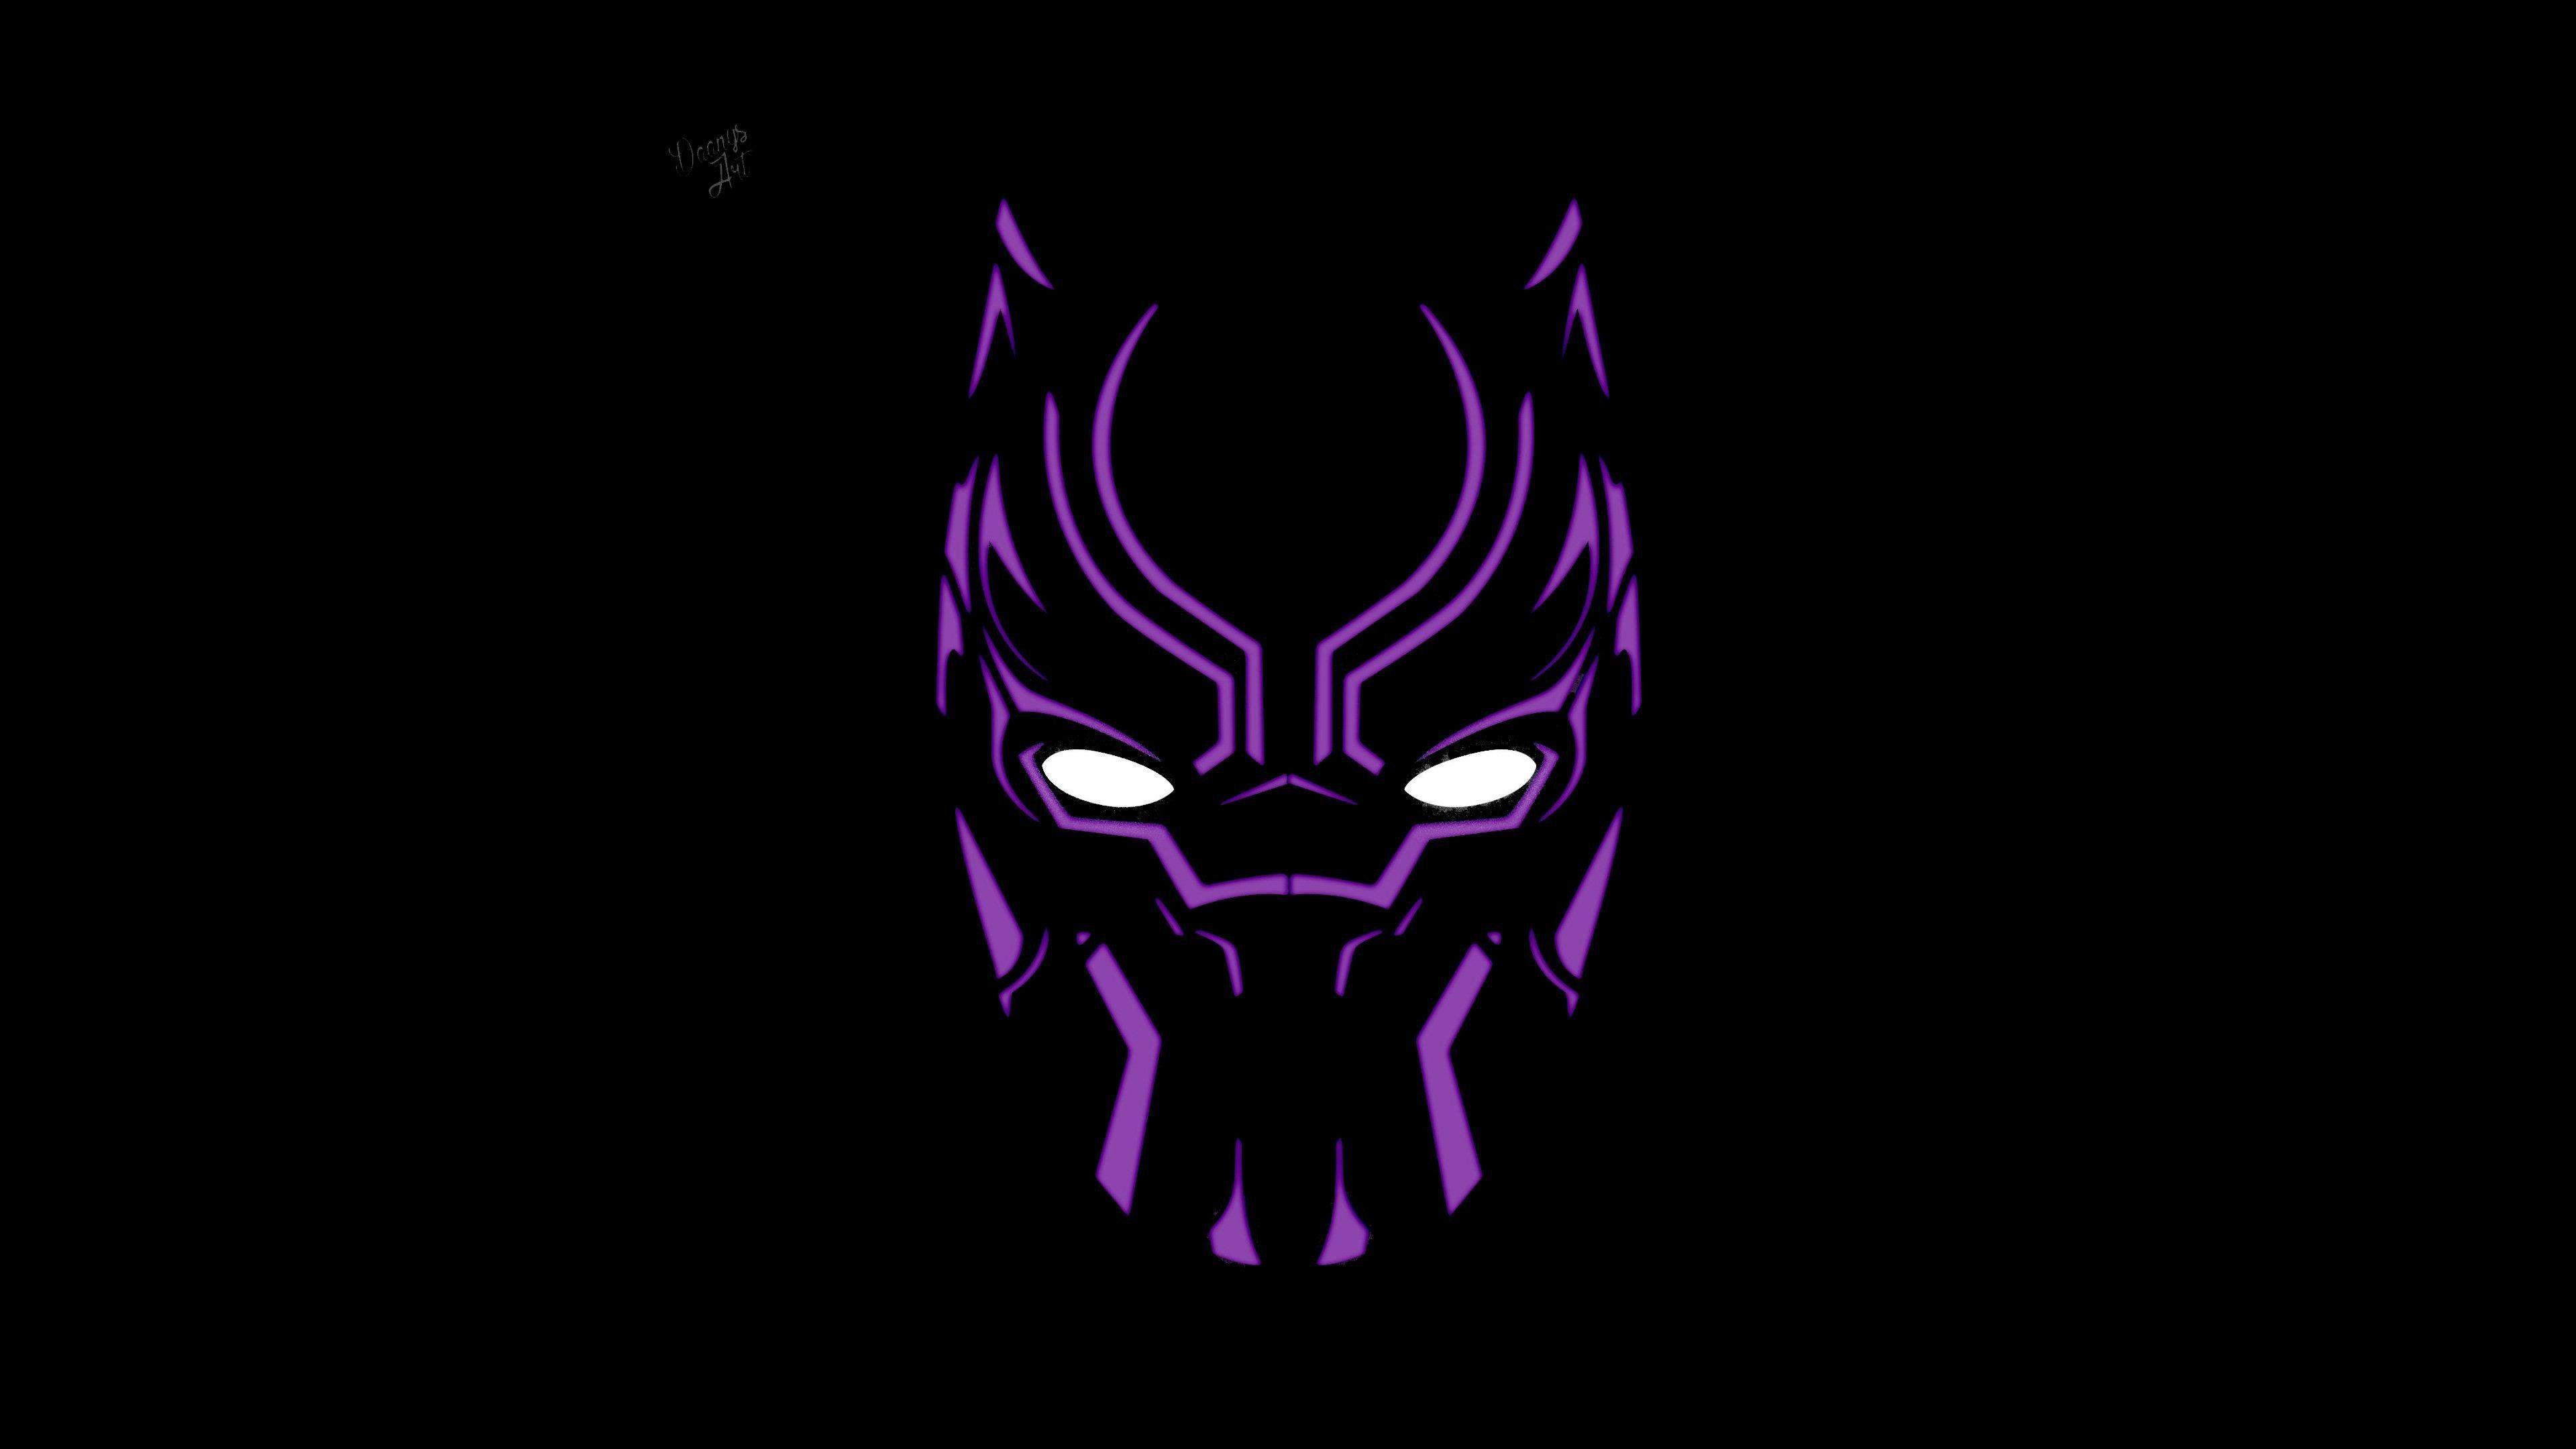 Black Panther Iphone Wallpapers Top Free Black Panther Iphone Backgrounds Wallpaperaccess